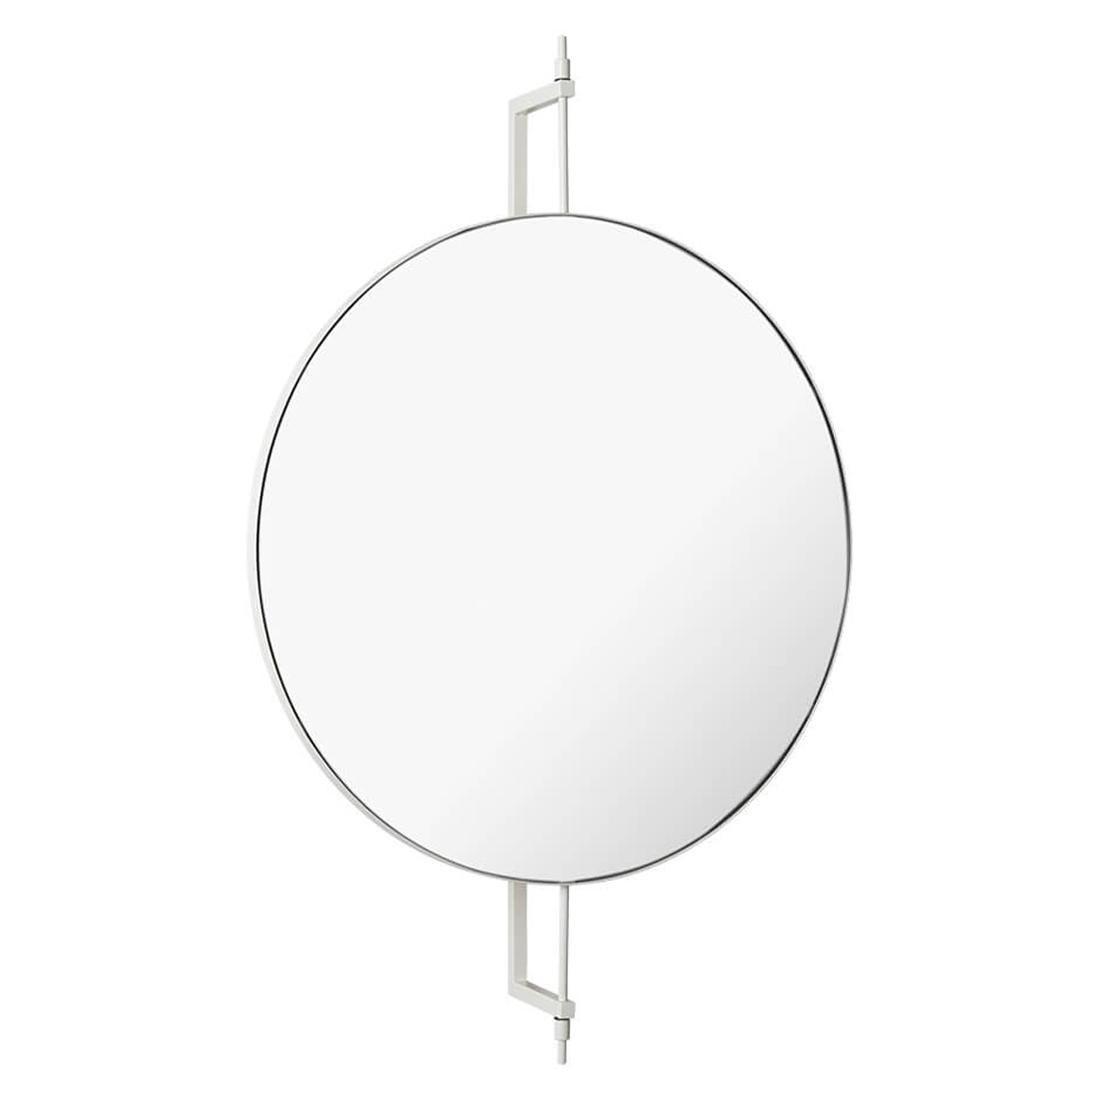 Stainless Steel Circle Rotating Mirror by Kristina Dam Studio